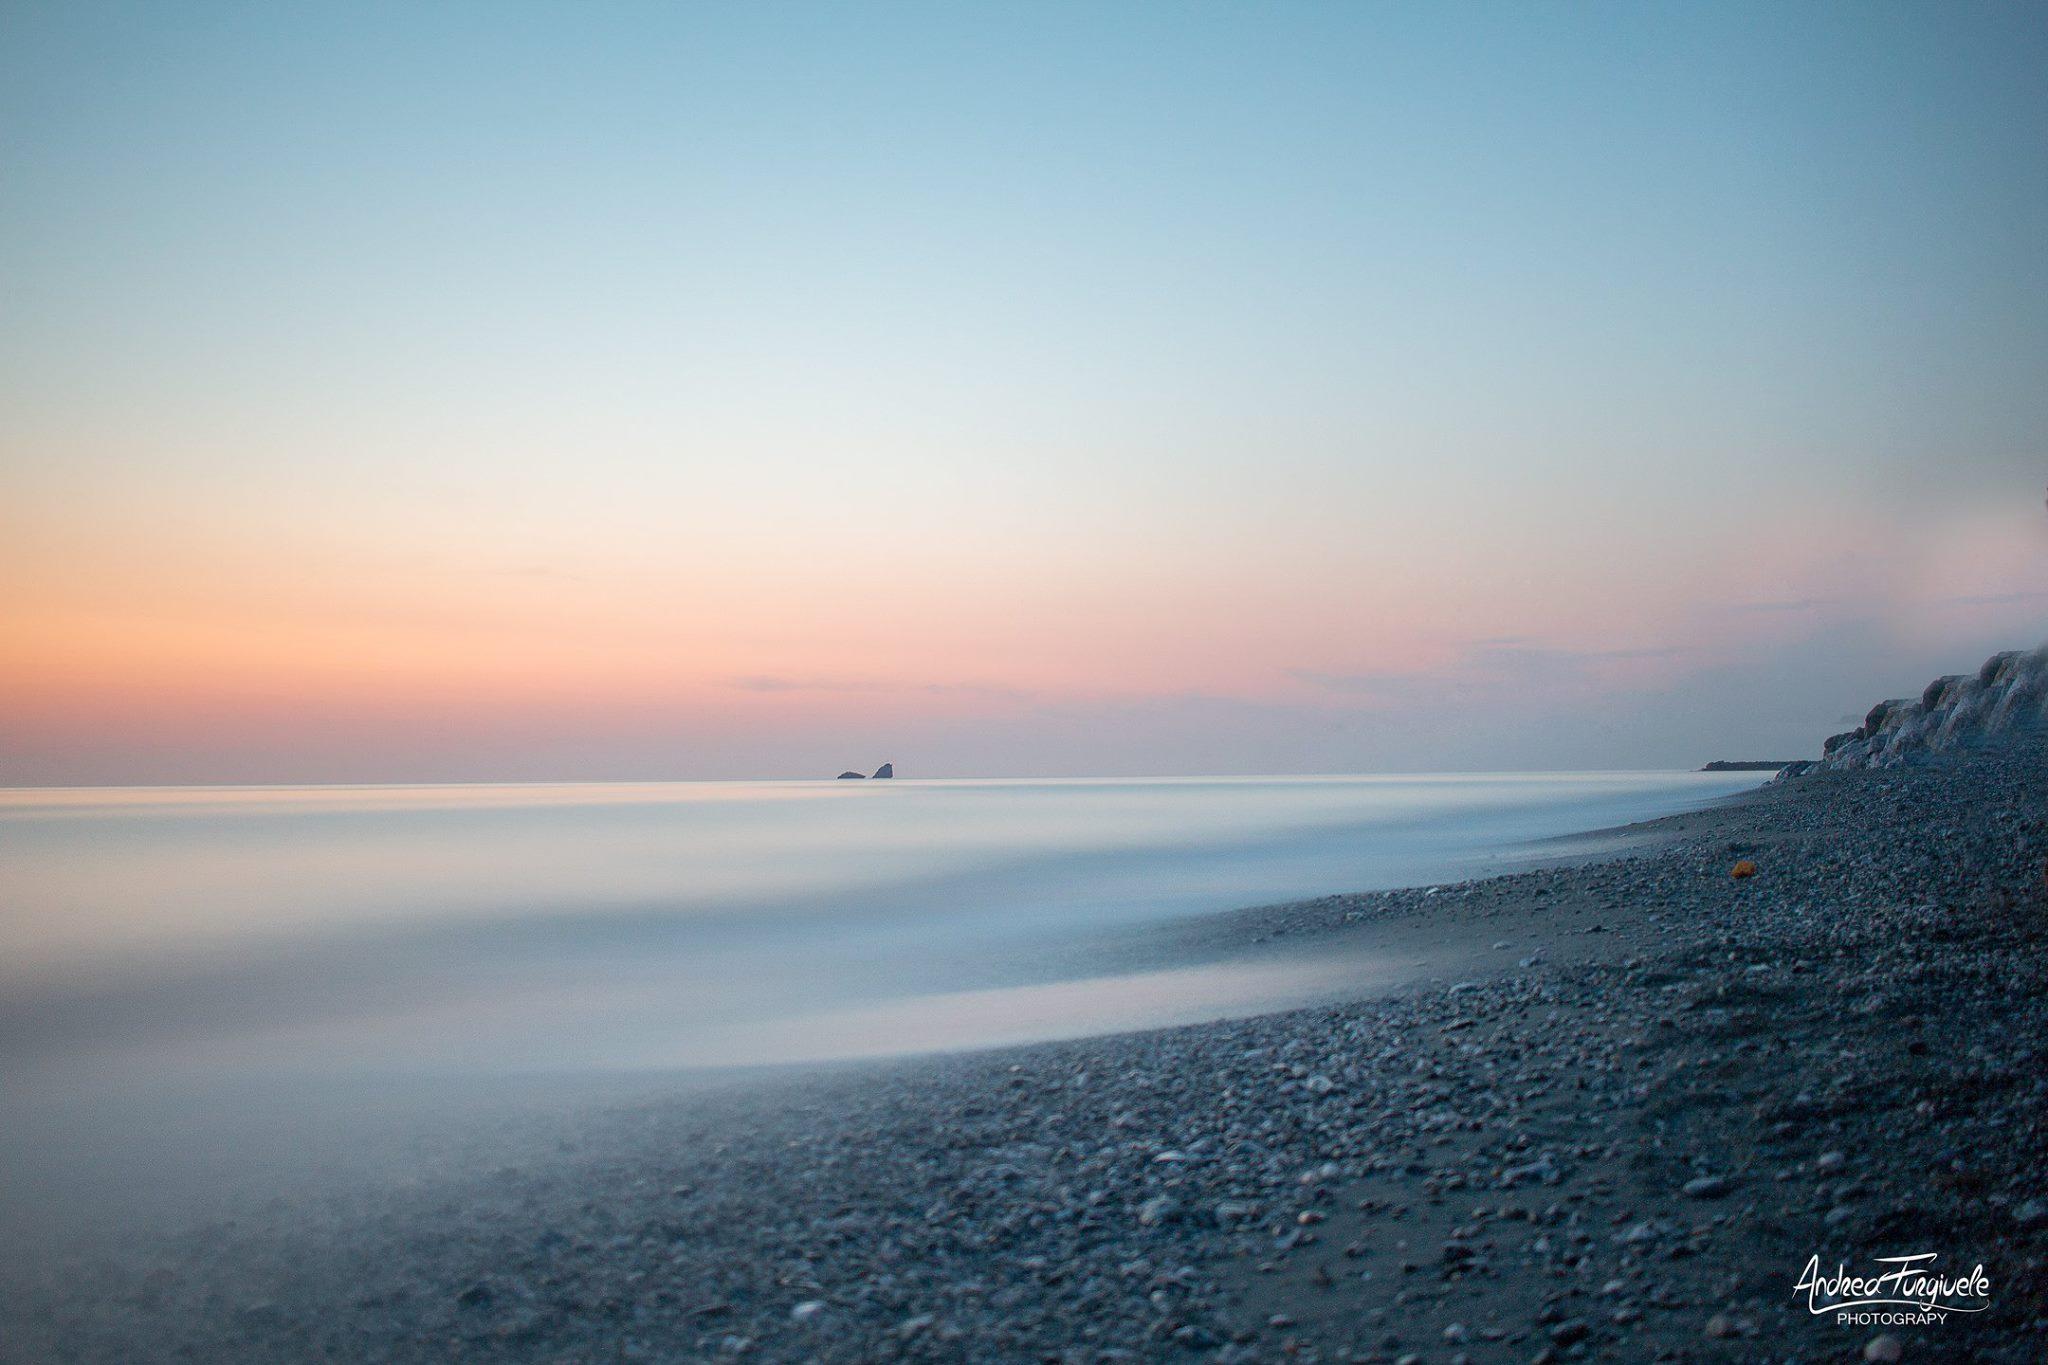 © Andrea Furgiuele Photography